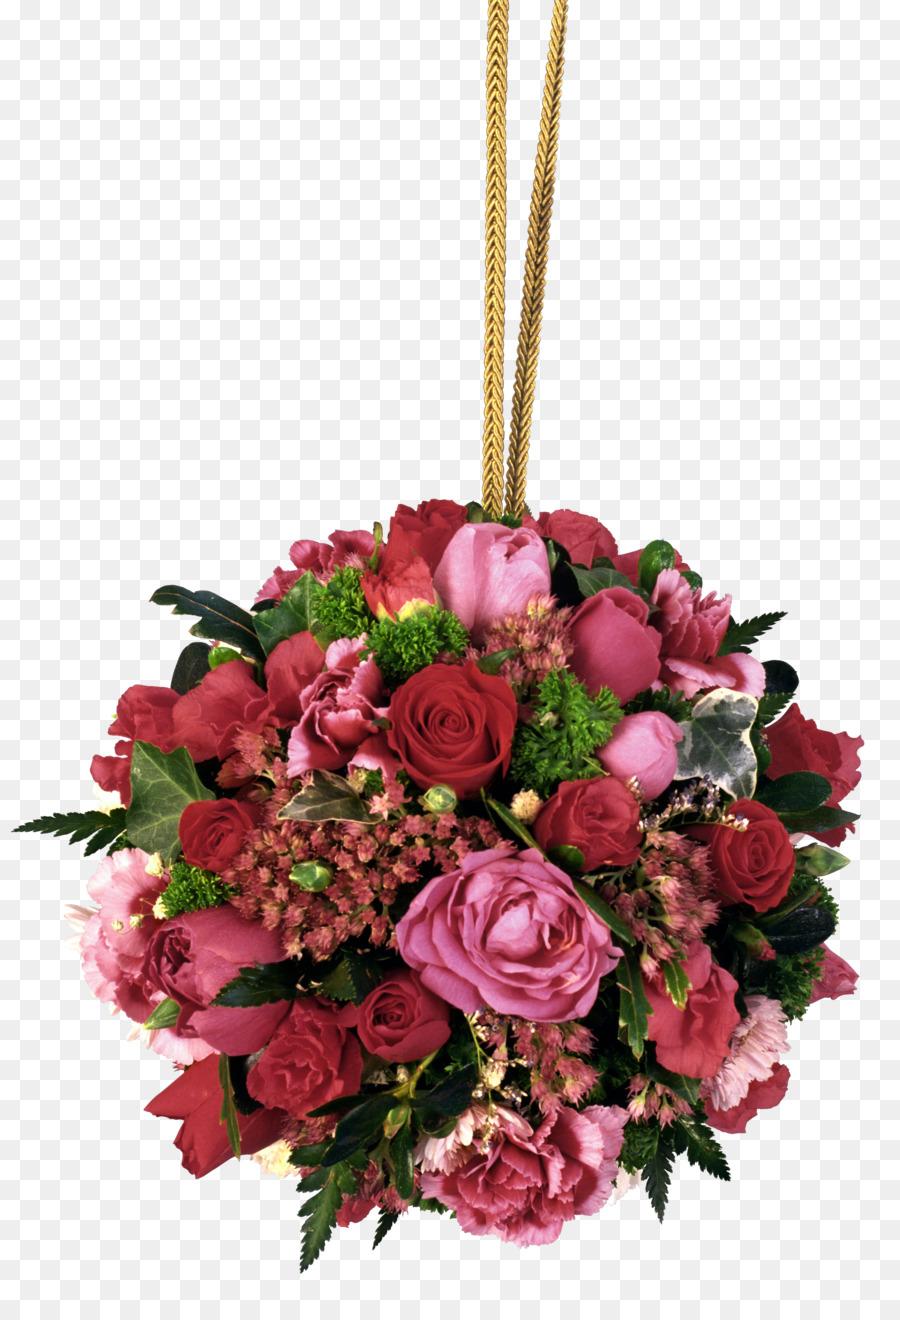 flower bouquet clip art hanging flower png download 2815 4072